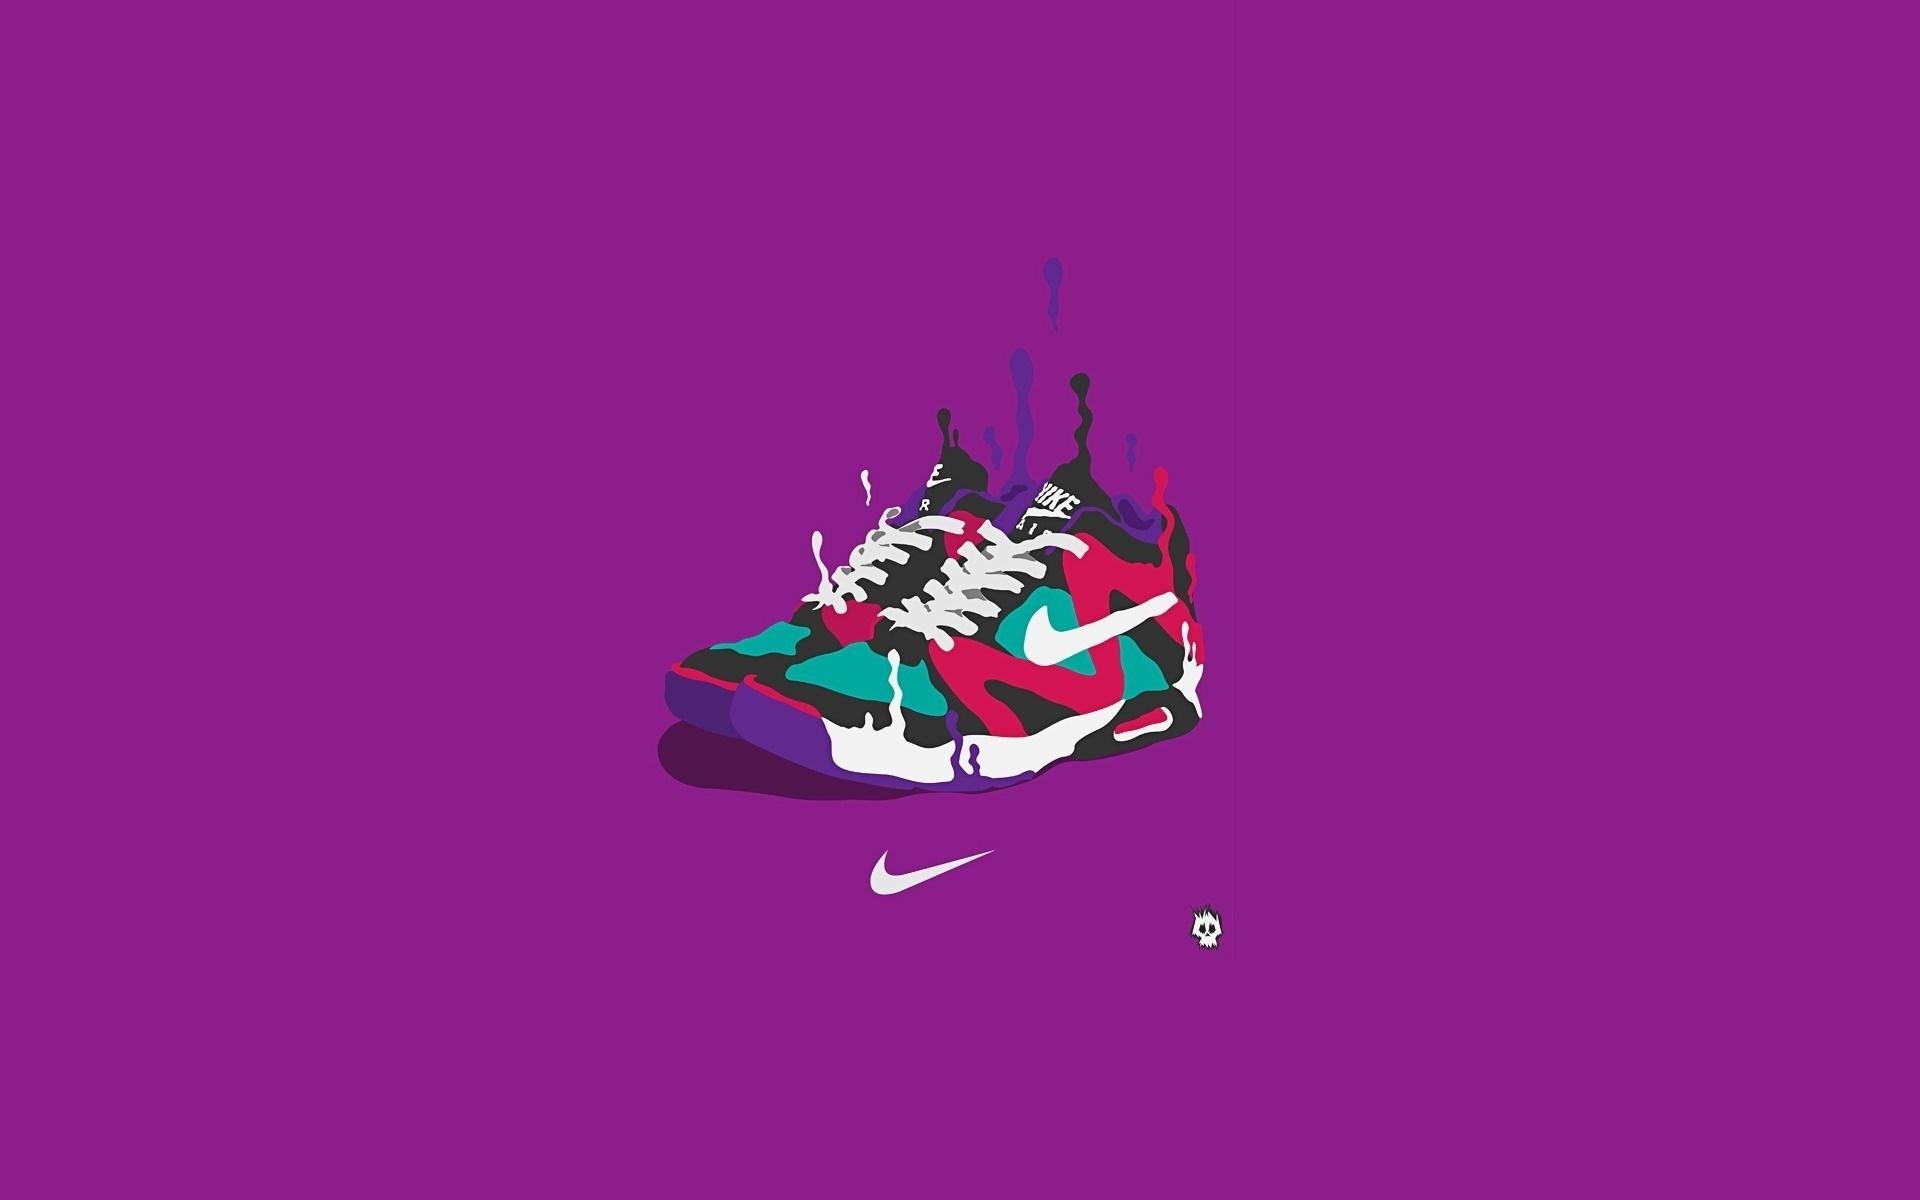 Nike Sneakers ART Sports Brand